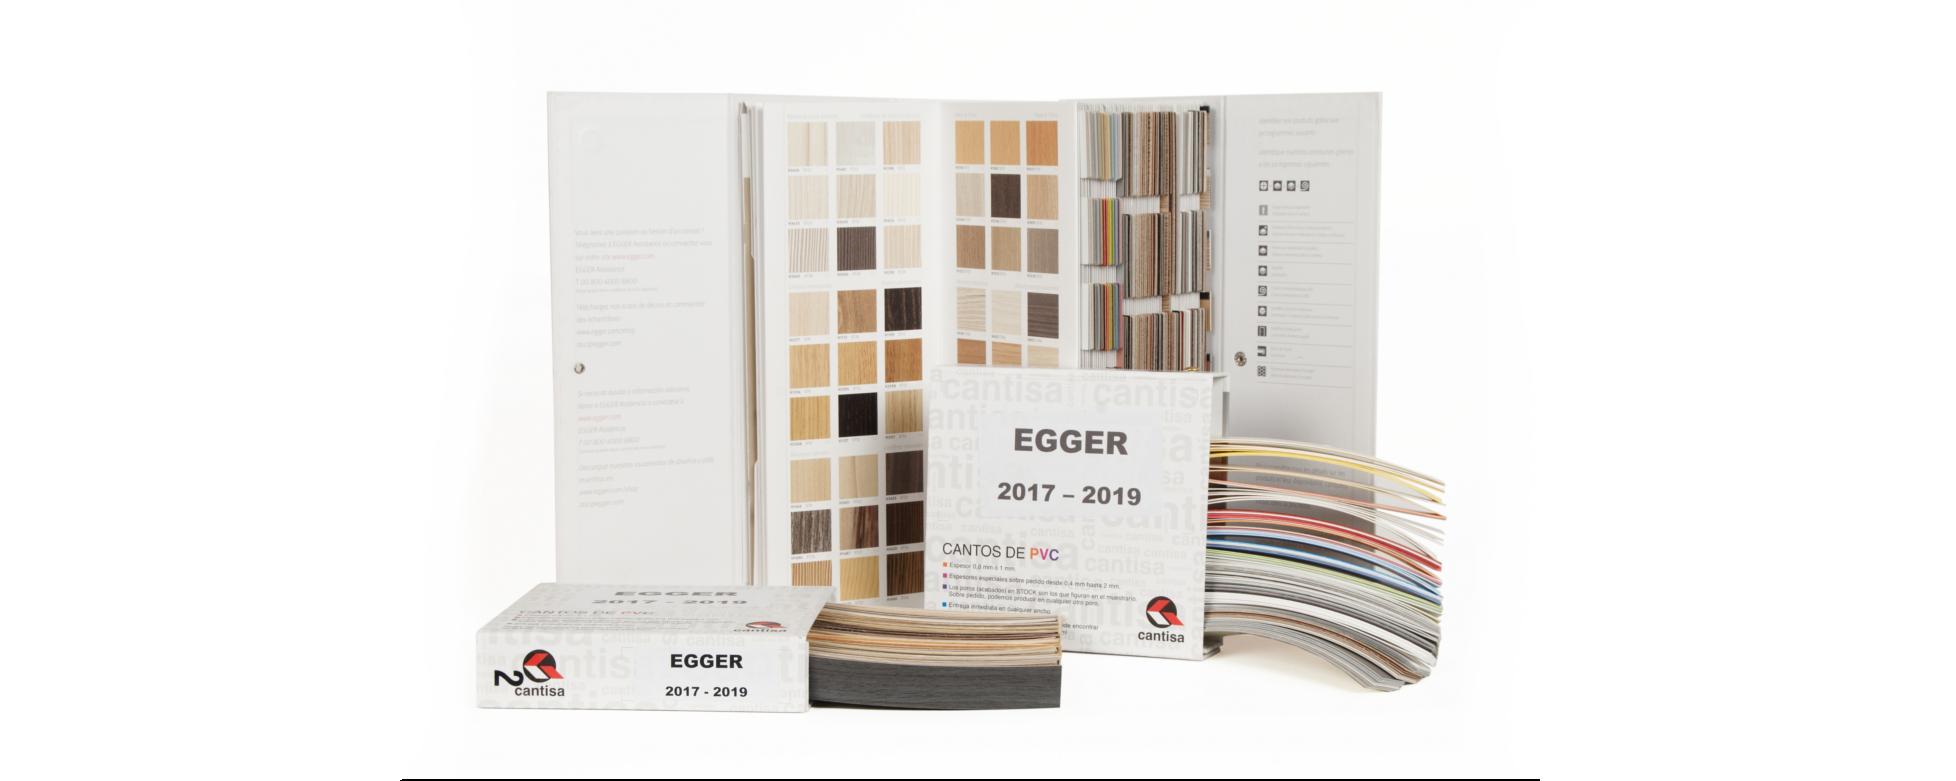 egger zoom 2017 2019 edgebanding in cantisa cantisa. Black Bedroom Furniture Sets. Home Design Ideas